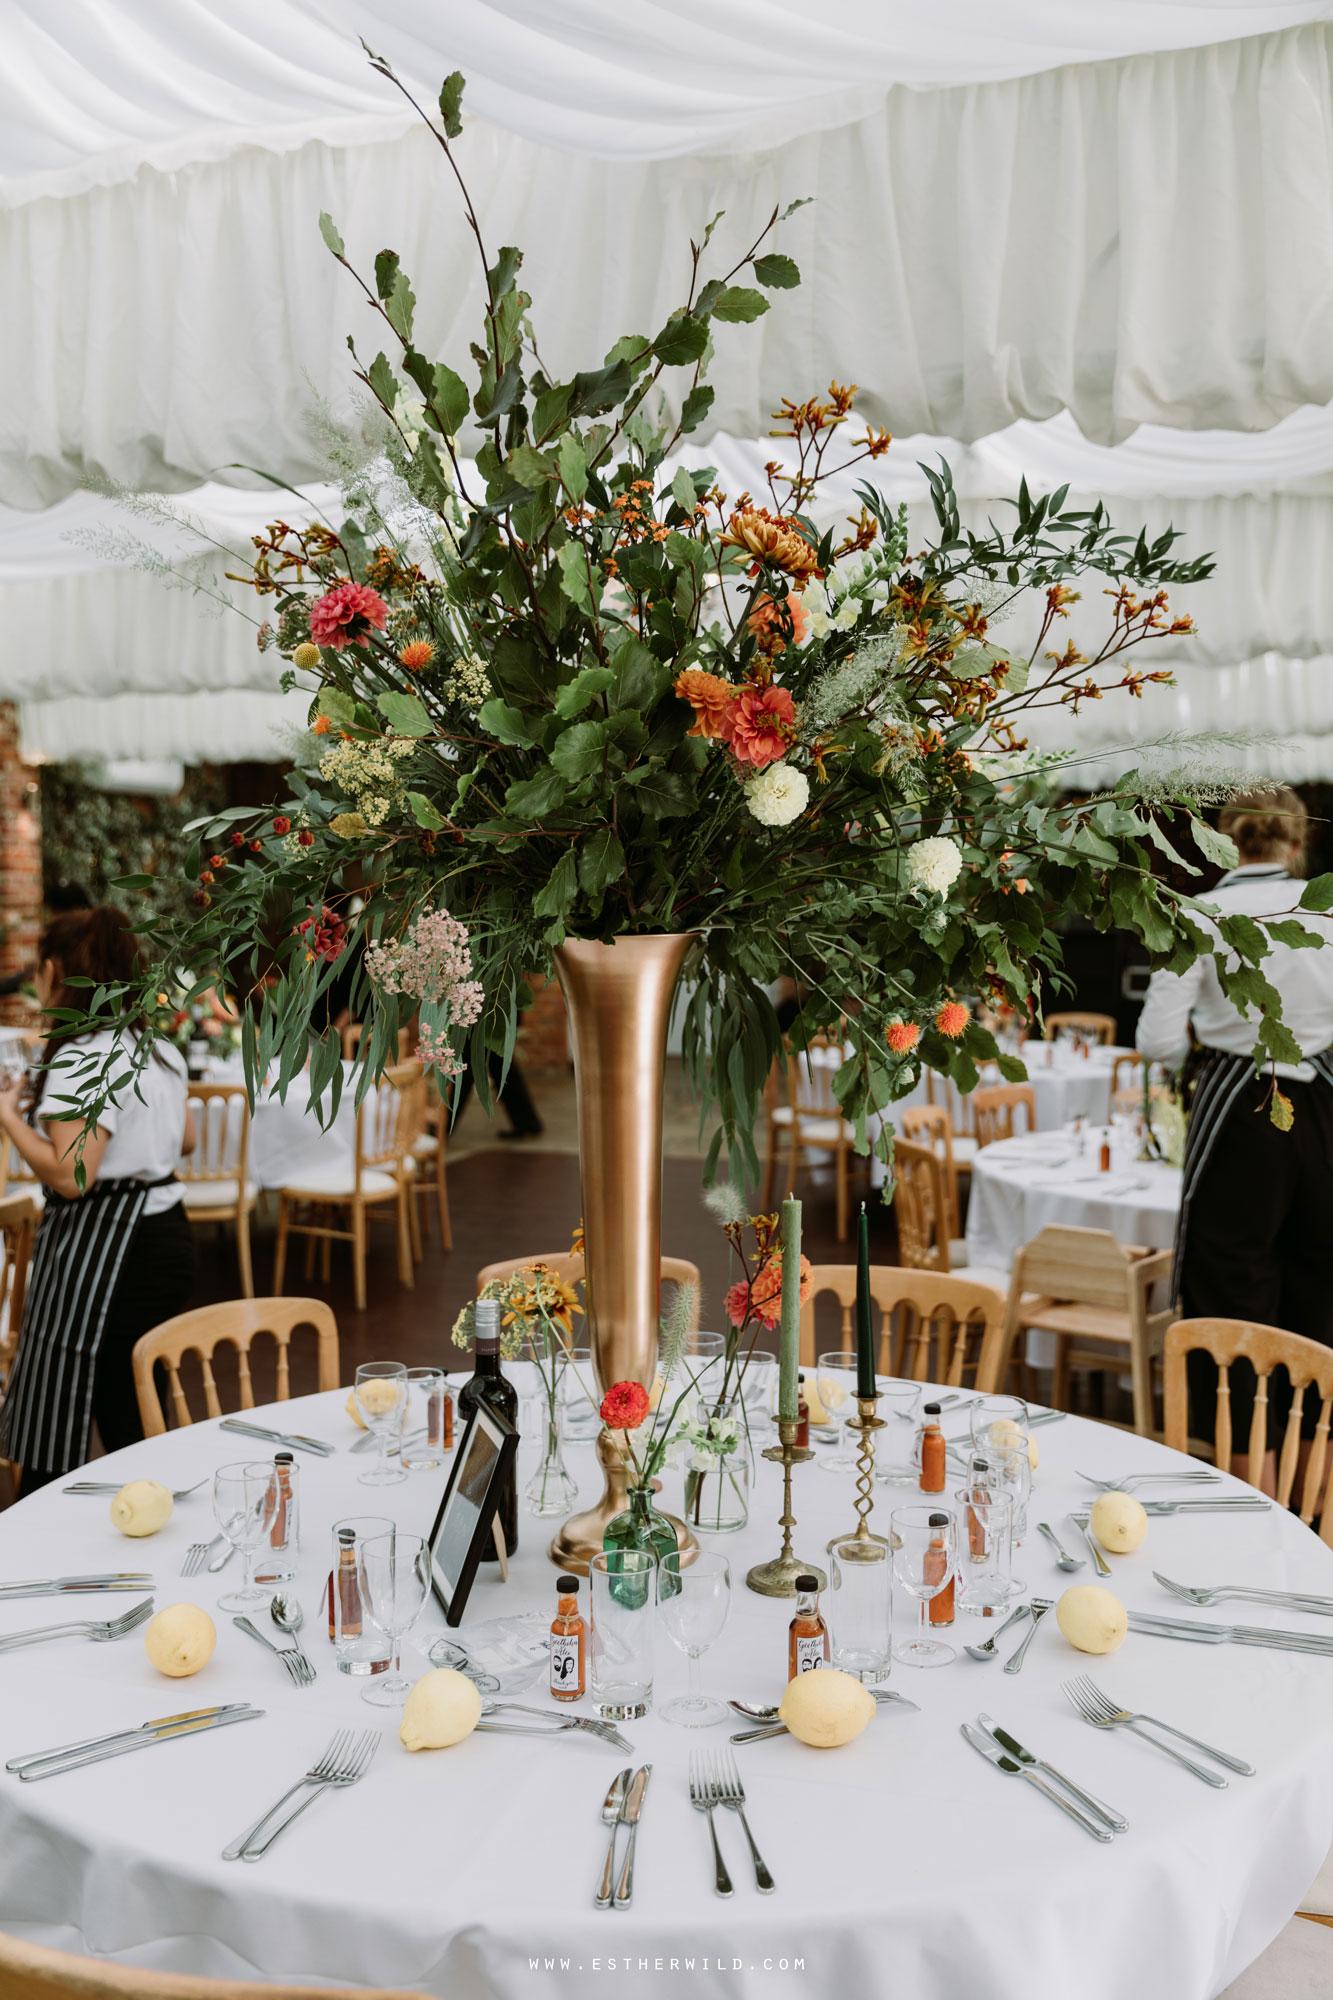 Northbrook_Park_Farnham_Surrey_London_Wedding_Hindu_Fusion_Esther_Wild_Photographer_IMG_5413.jpg